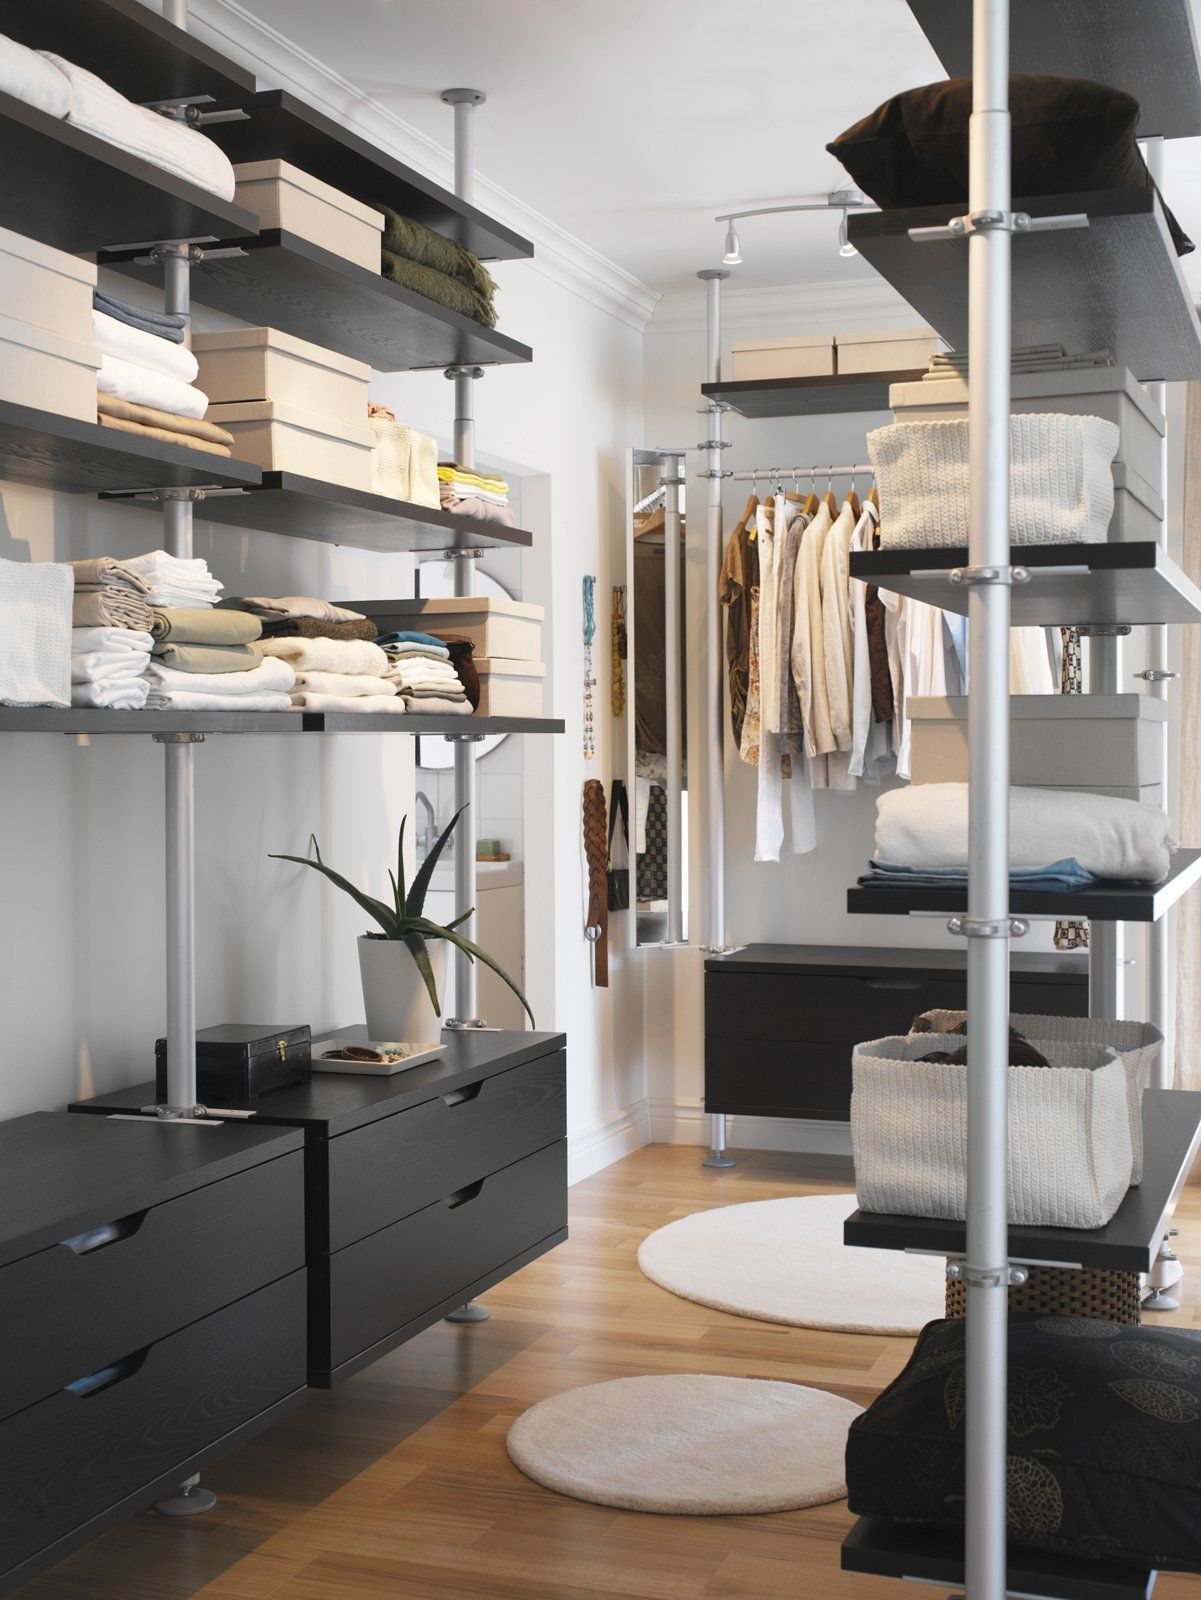 Componenti Cabina Armadio Ikea.10 Modern Walk In Closets Home Dressing Room Closet Closet Designs